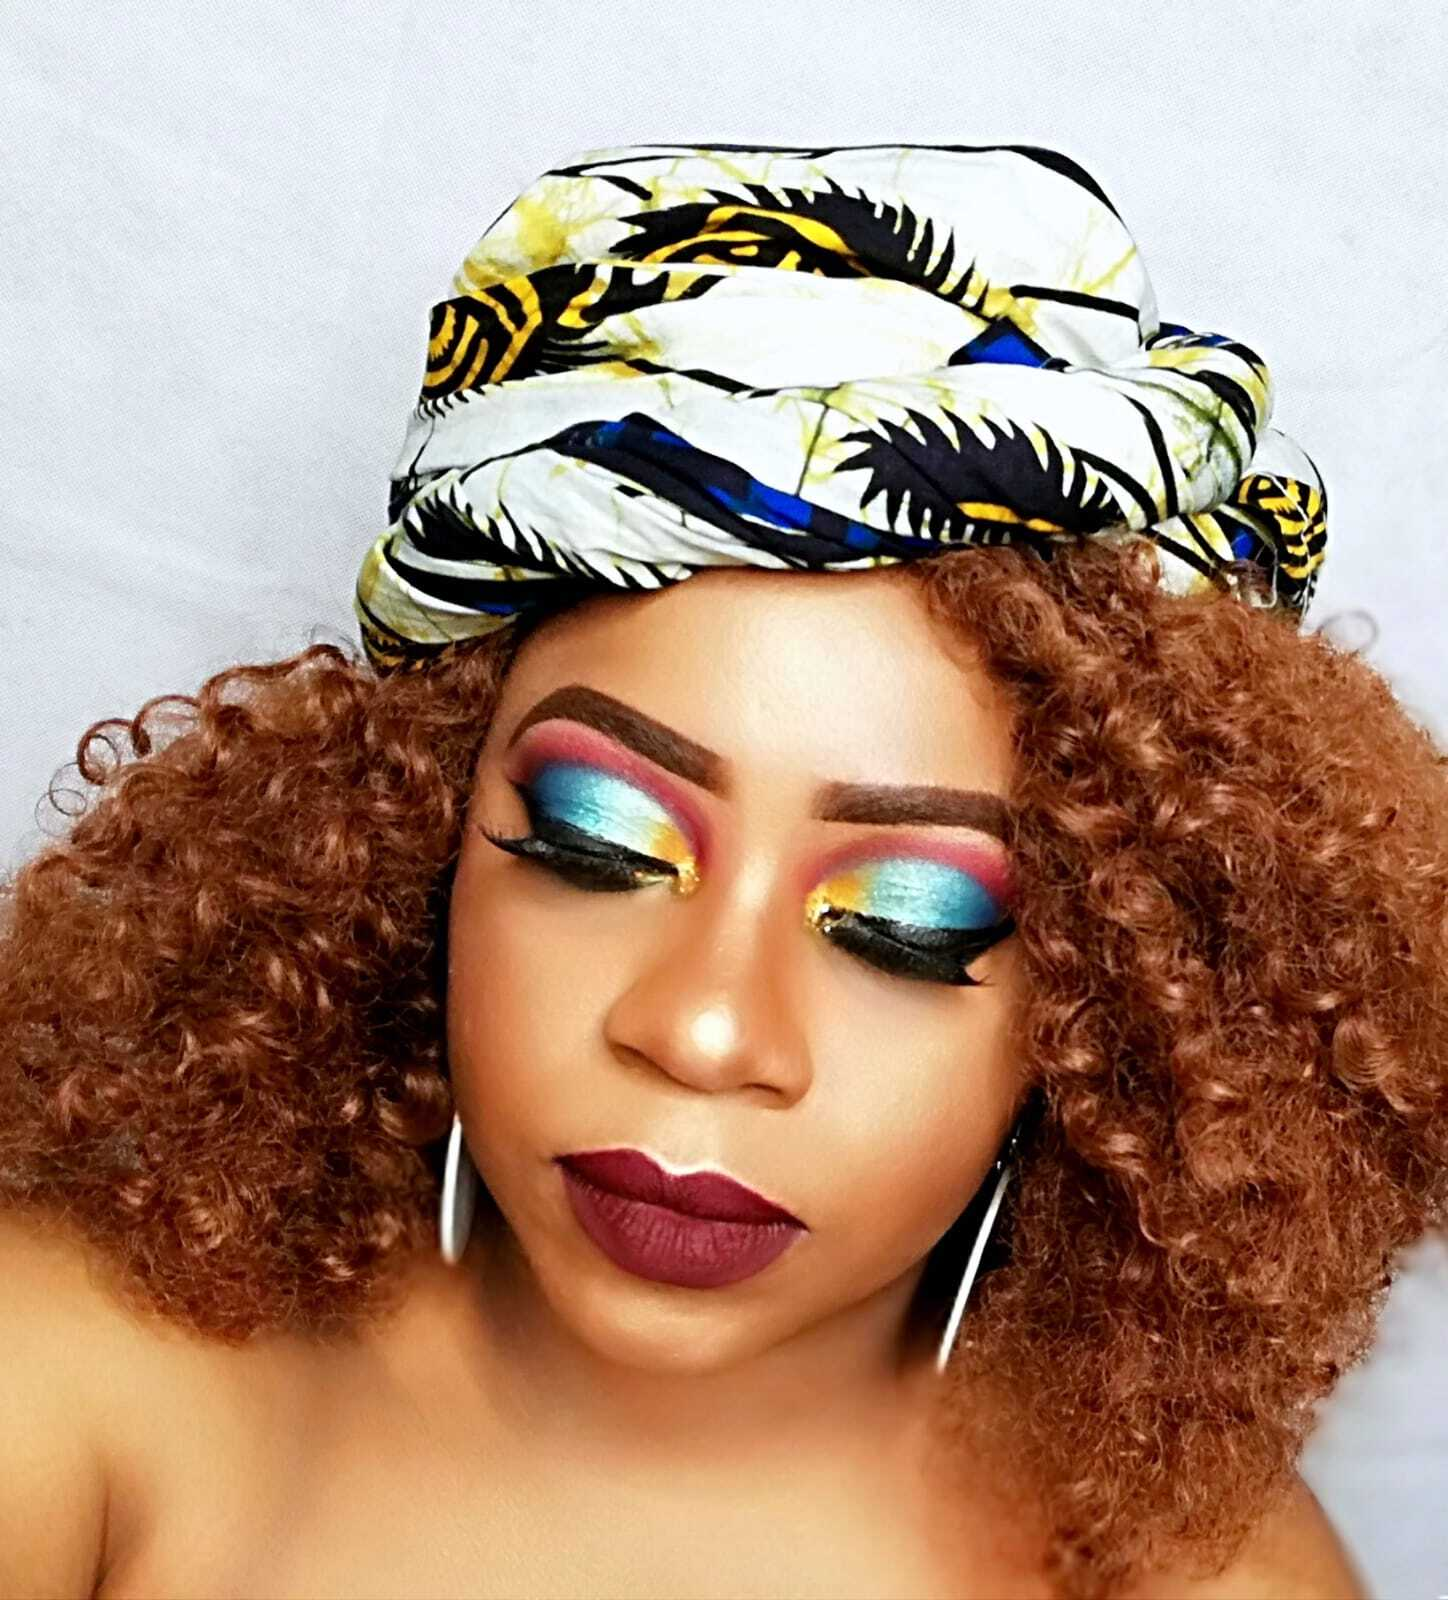 Top Cameroonian makeup artist Klarah Enie